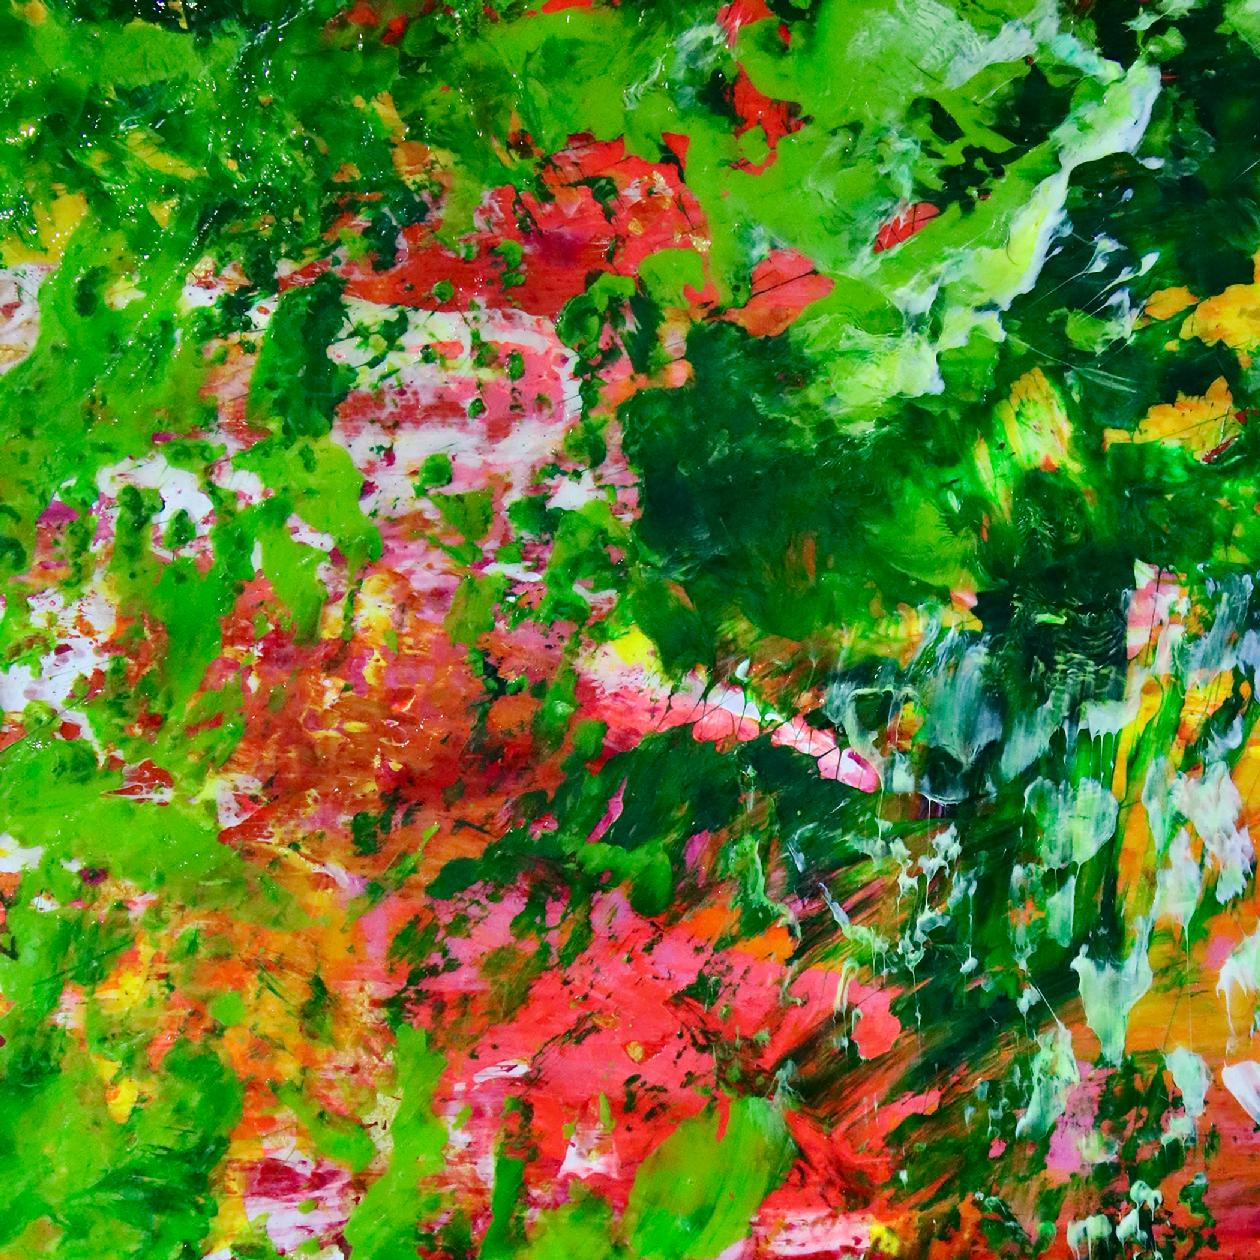 Detail - Verdor ( Green Regrowth) 2020 by Nestor Toro